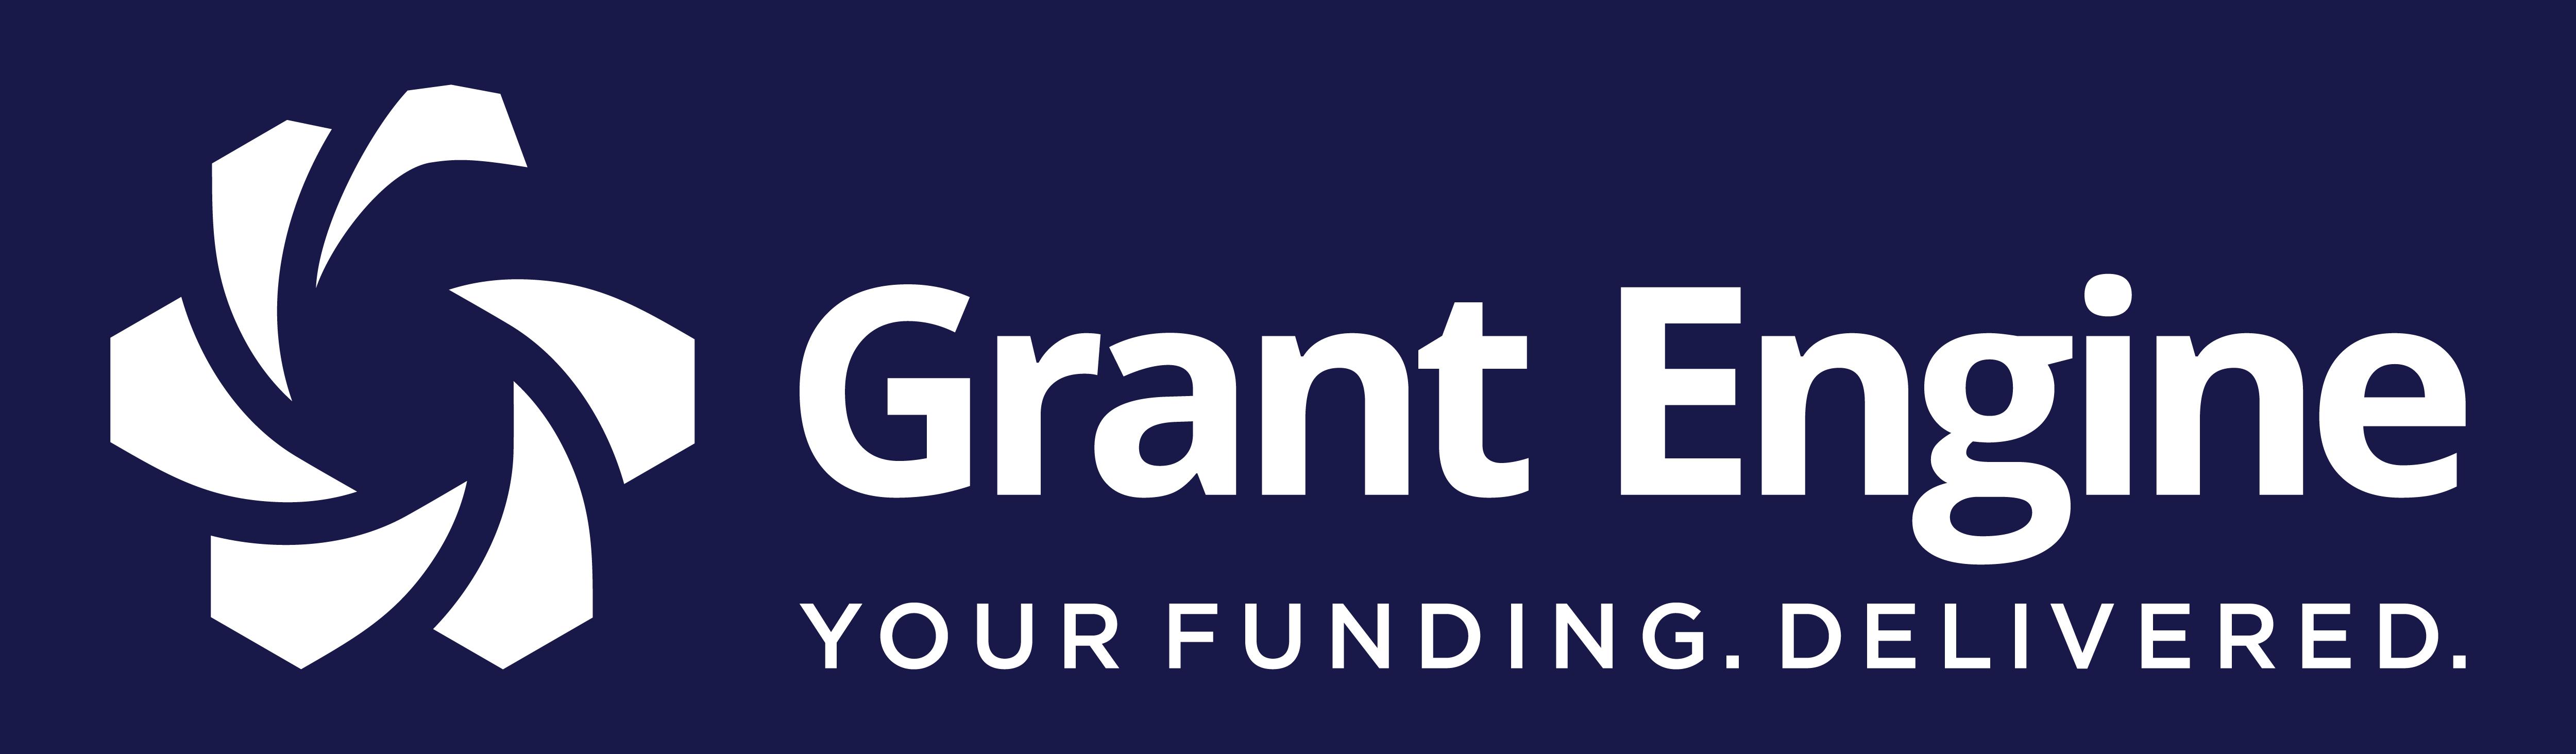 Grant Engine